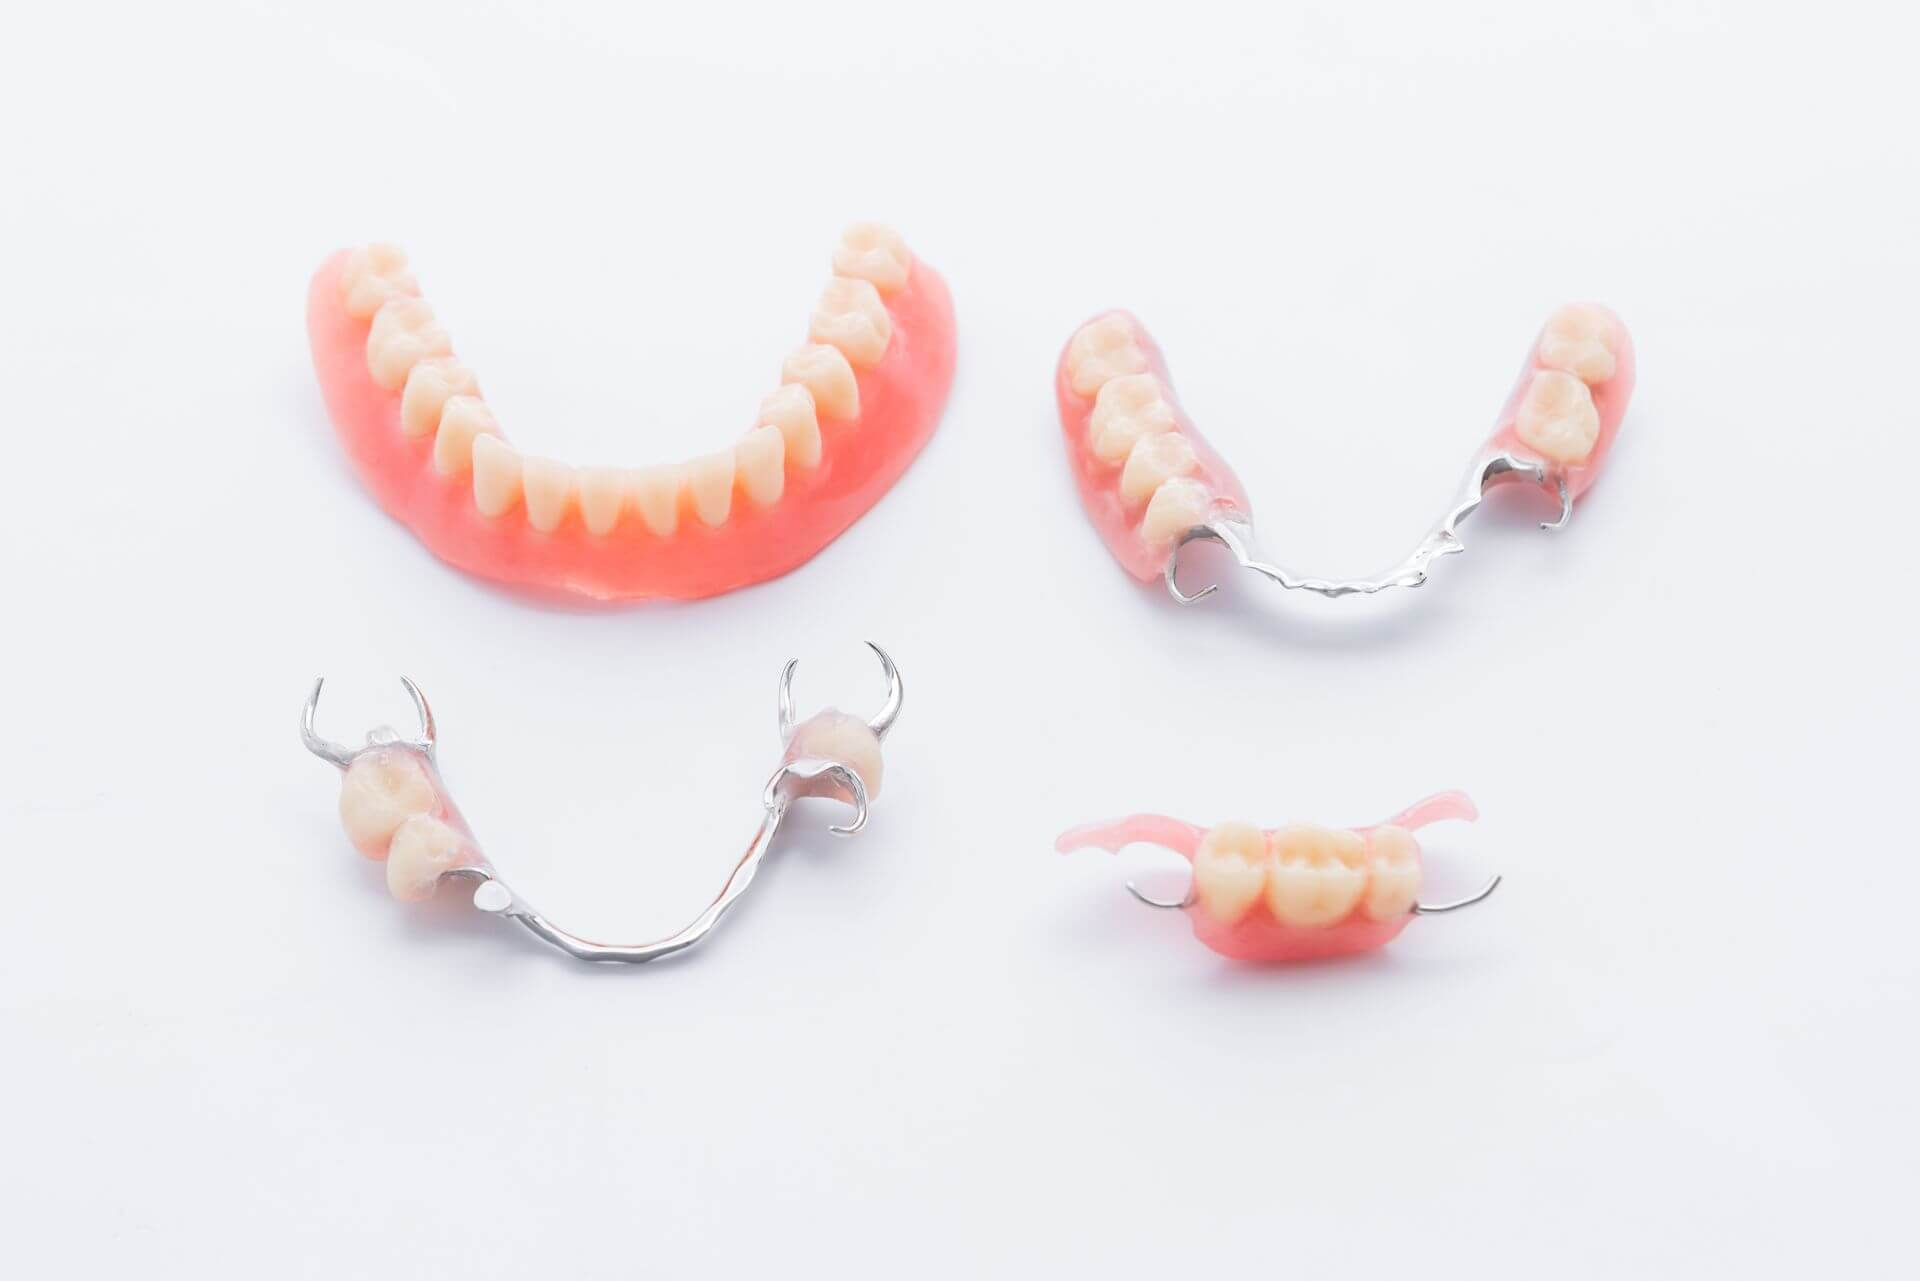 Protesi dentaria mobile senza palato